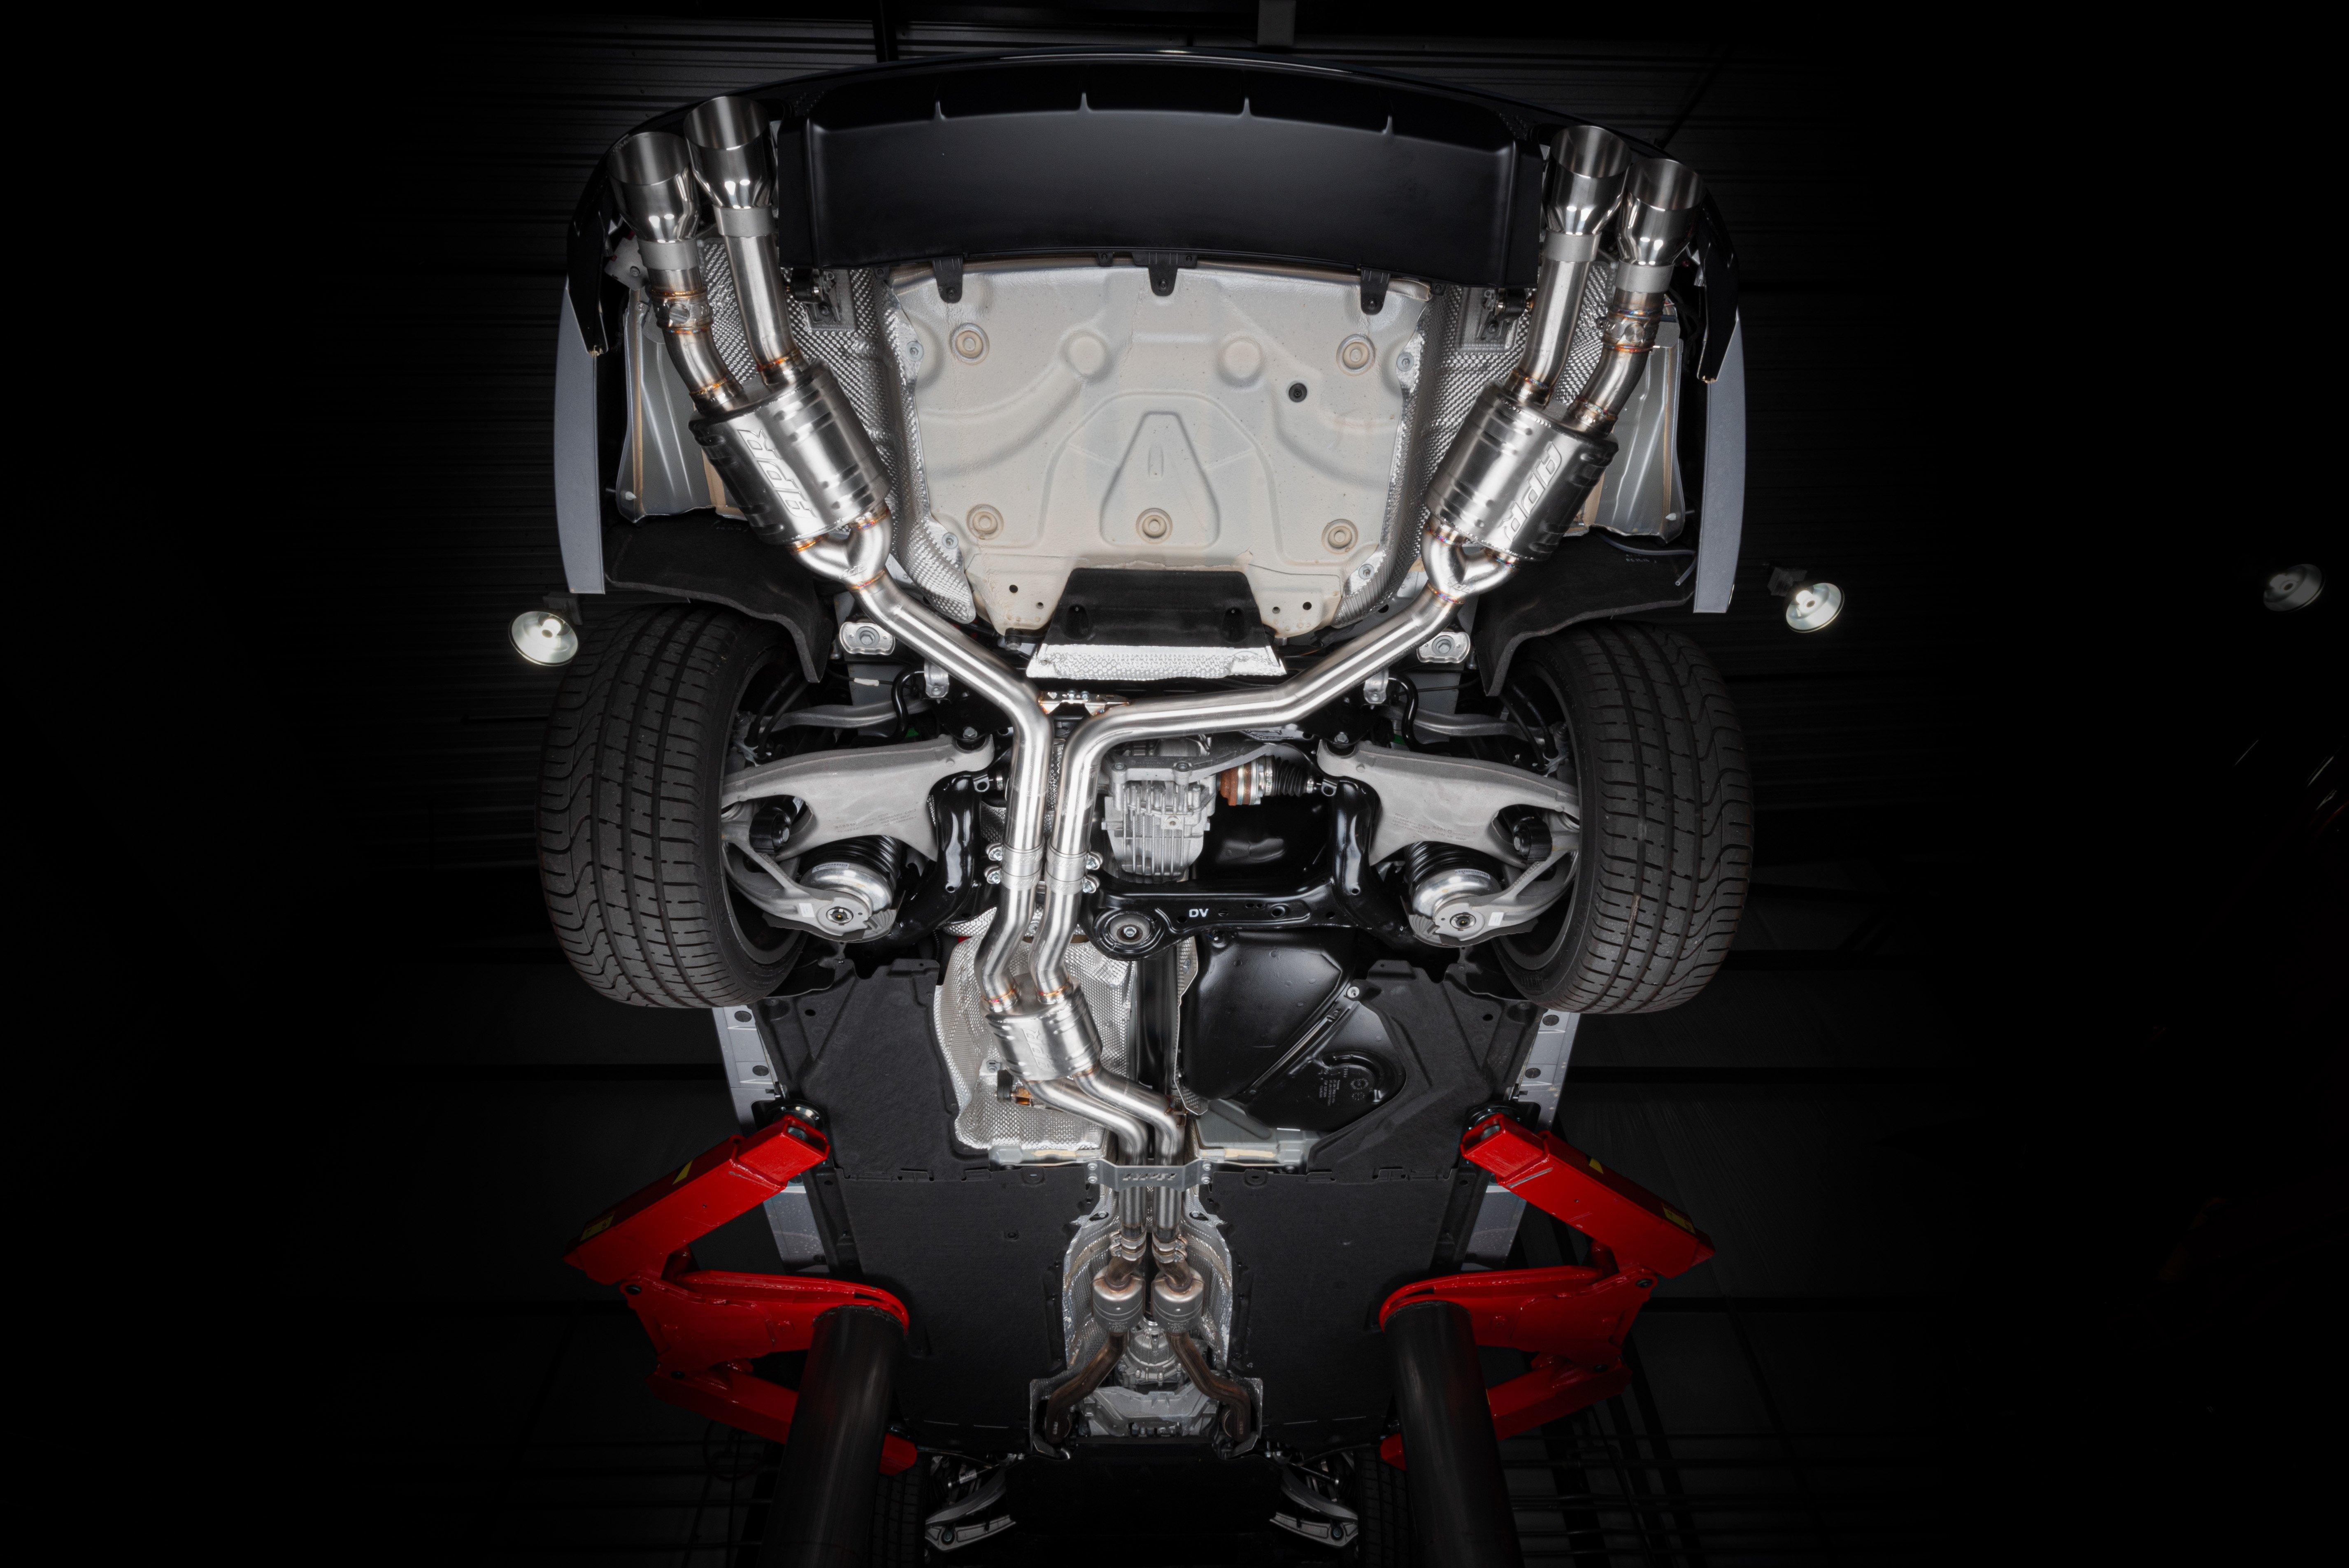 APR C7 / C7 5 S6 / S7 4 0 TFSI Catback Exhaust System